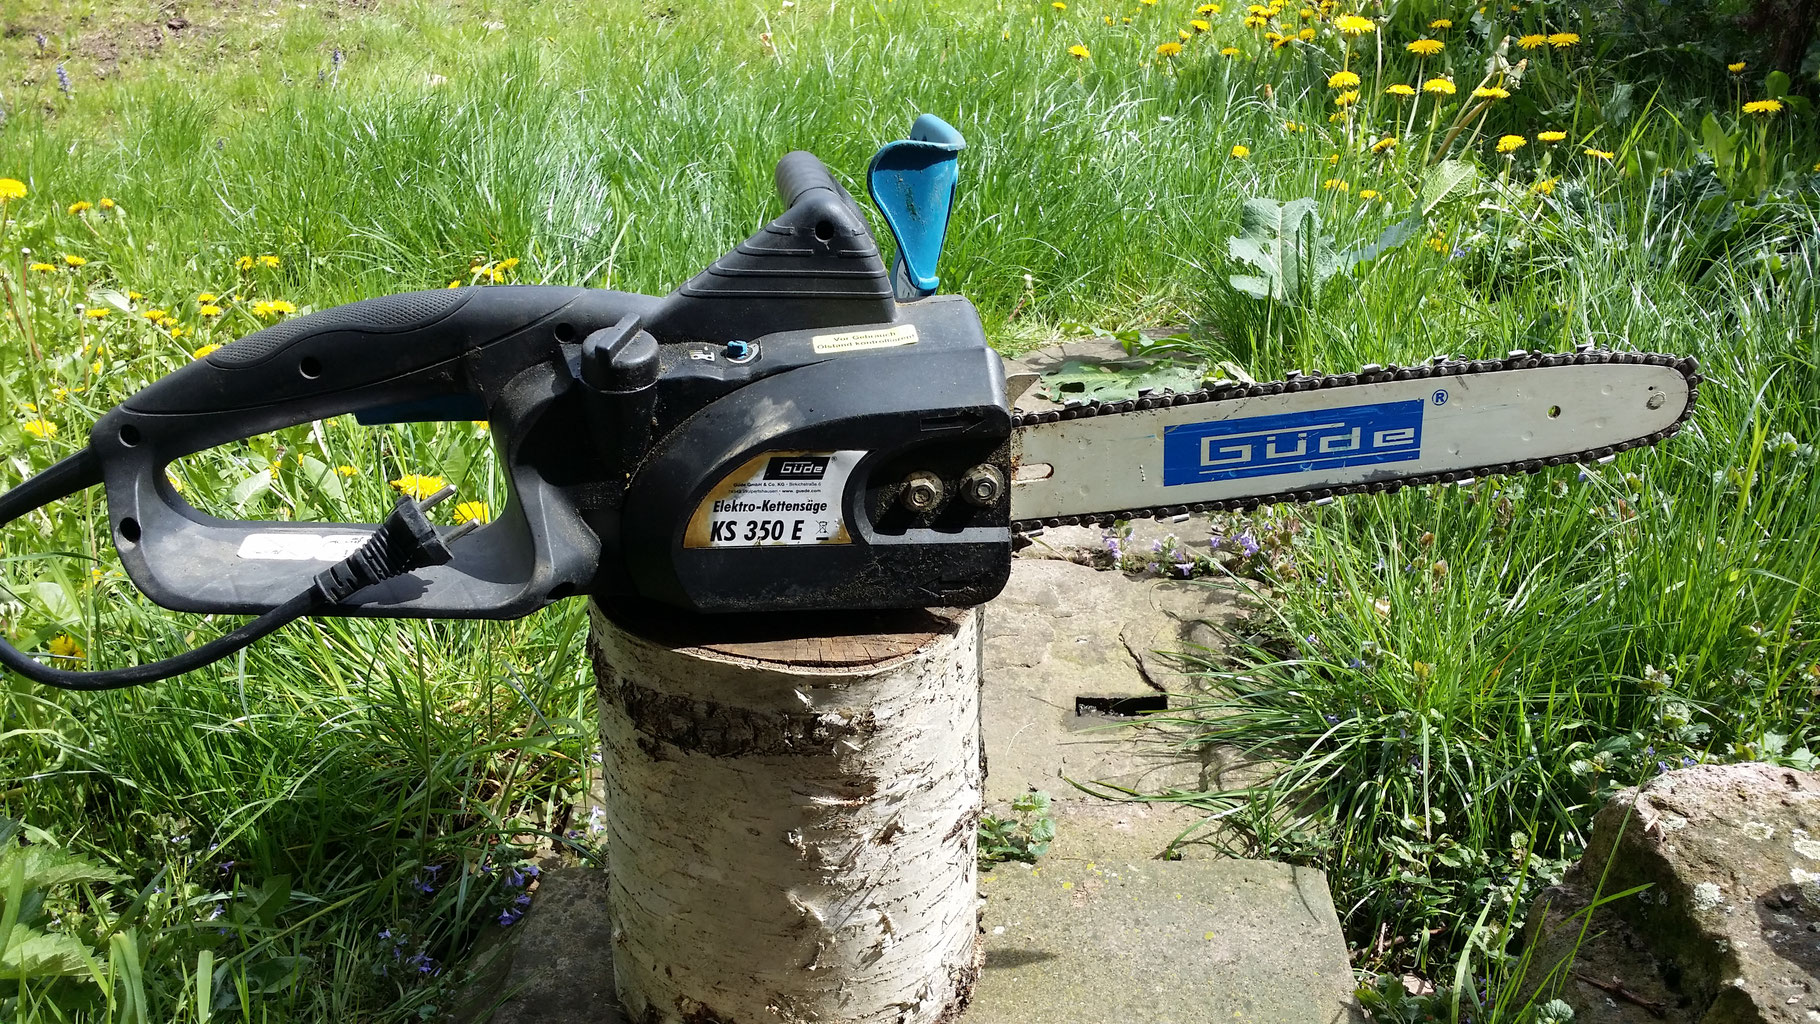 elektro-kettensäge gÜde ks 350 e - mietzeug.de - gutes werkzeug